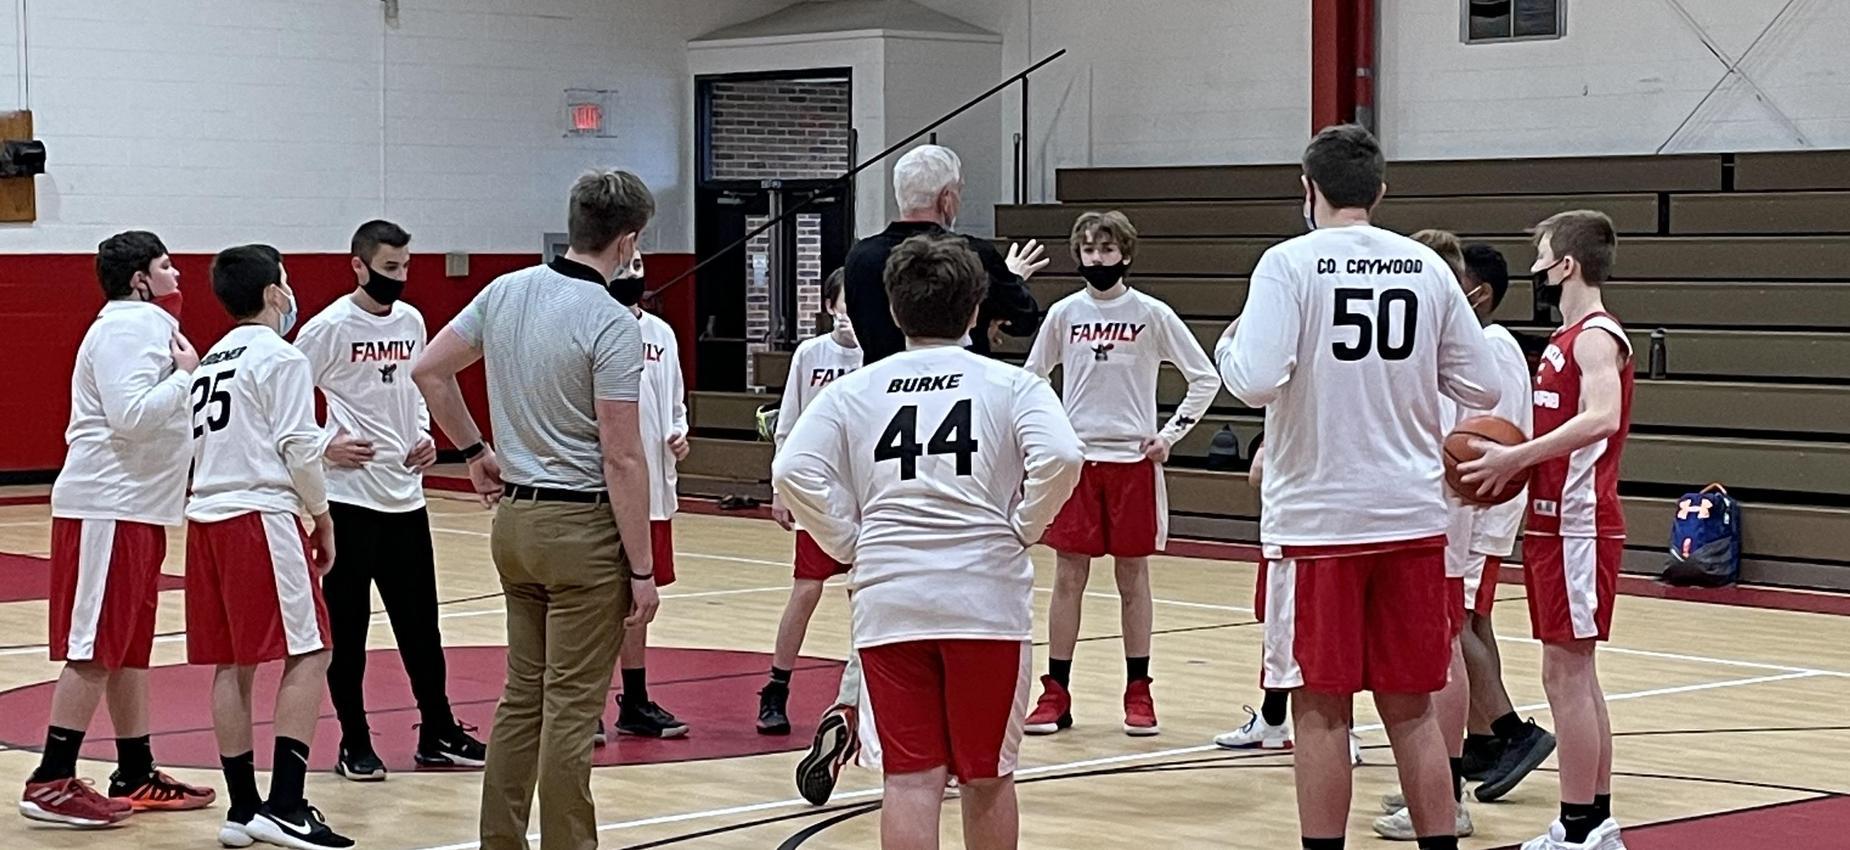 A coach talks to a basketball team in a gym.